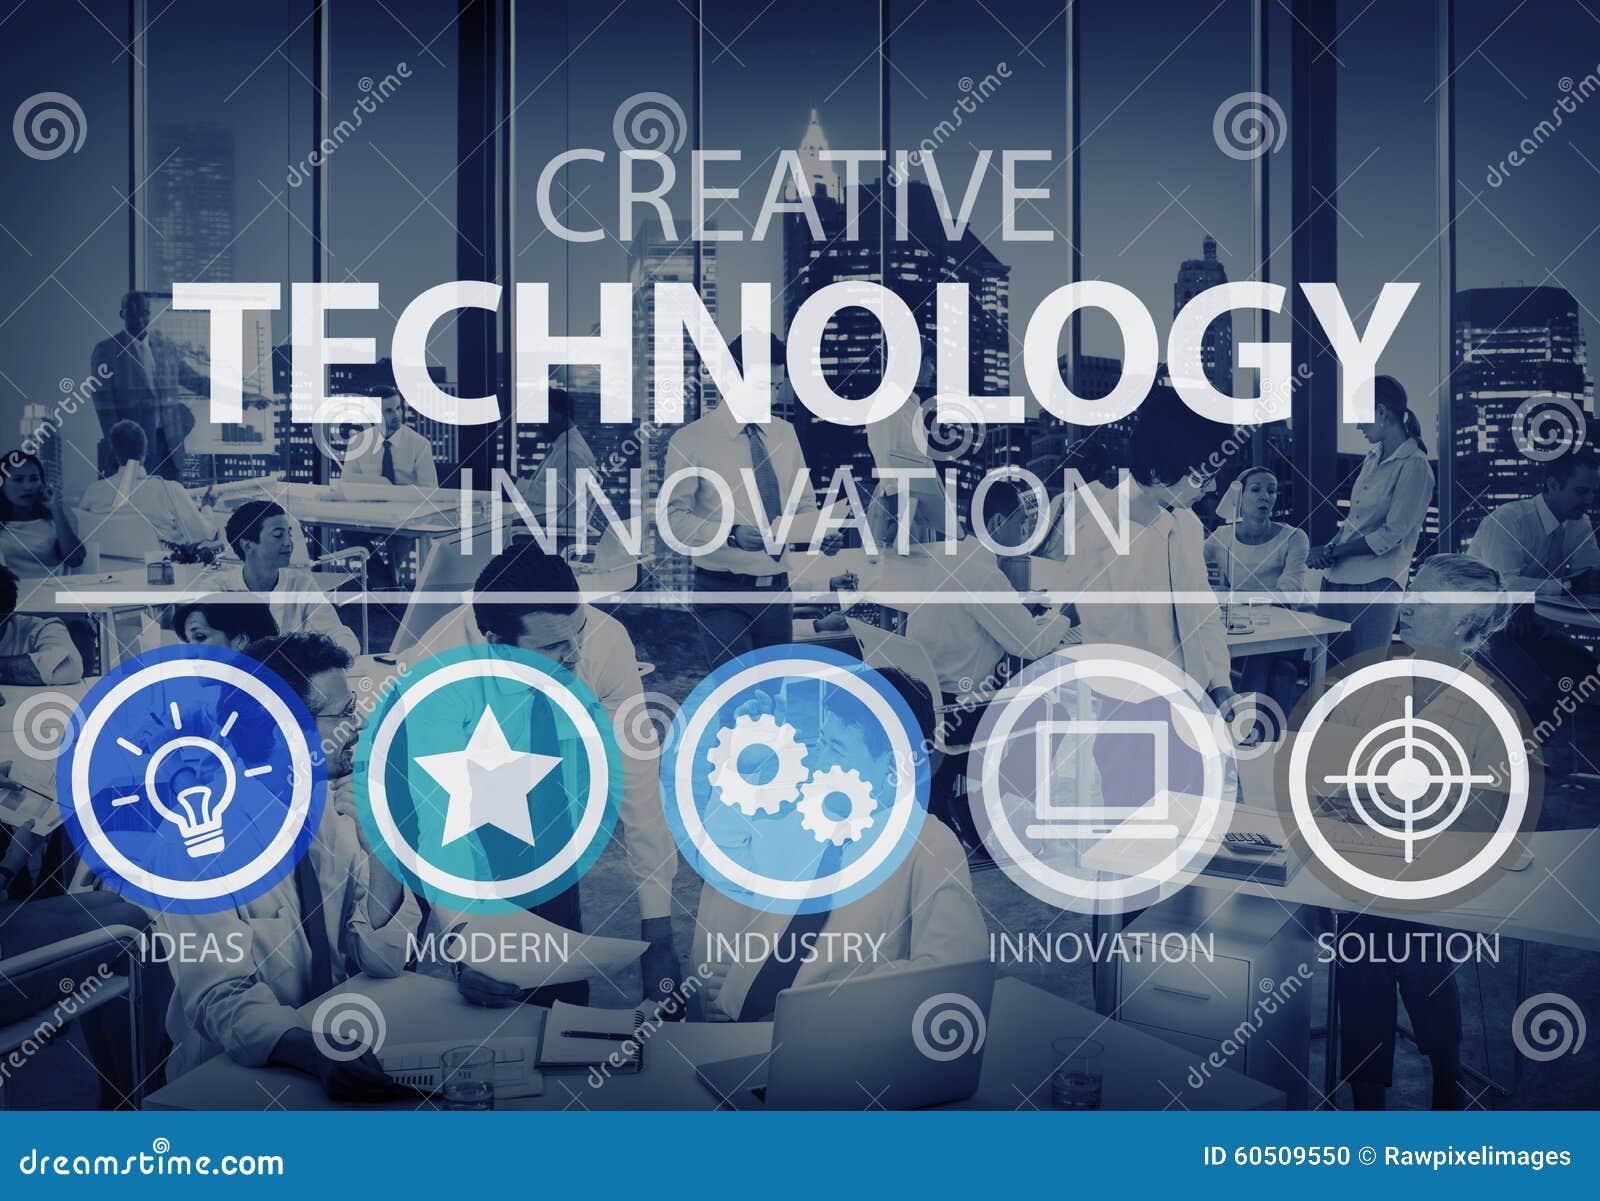 Technology Management Image: Creative Technology Innovation Media Digital Concept Stock